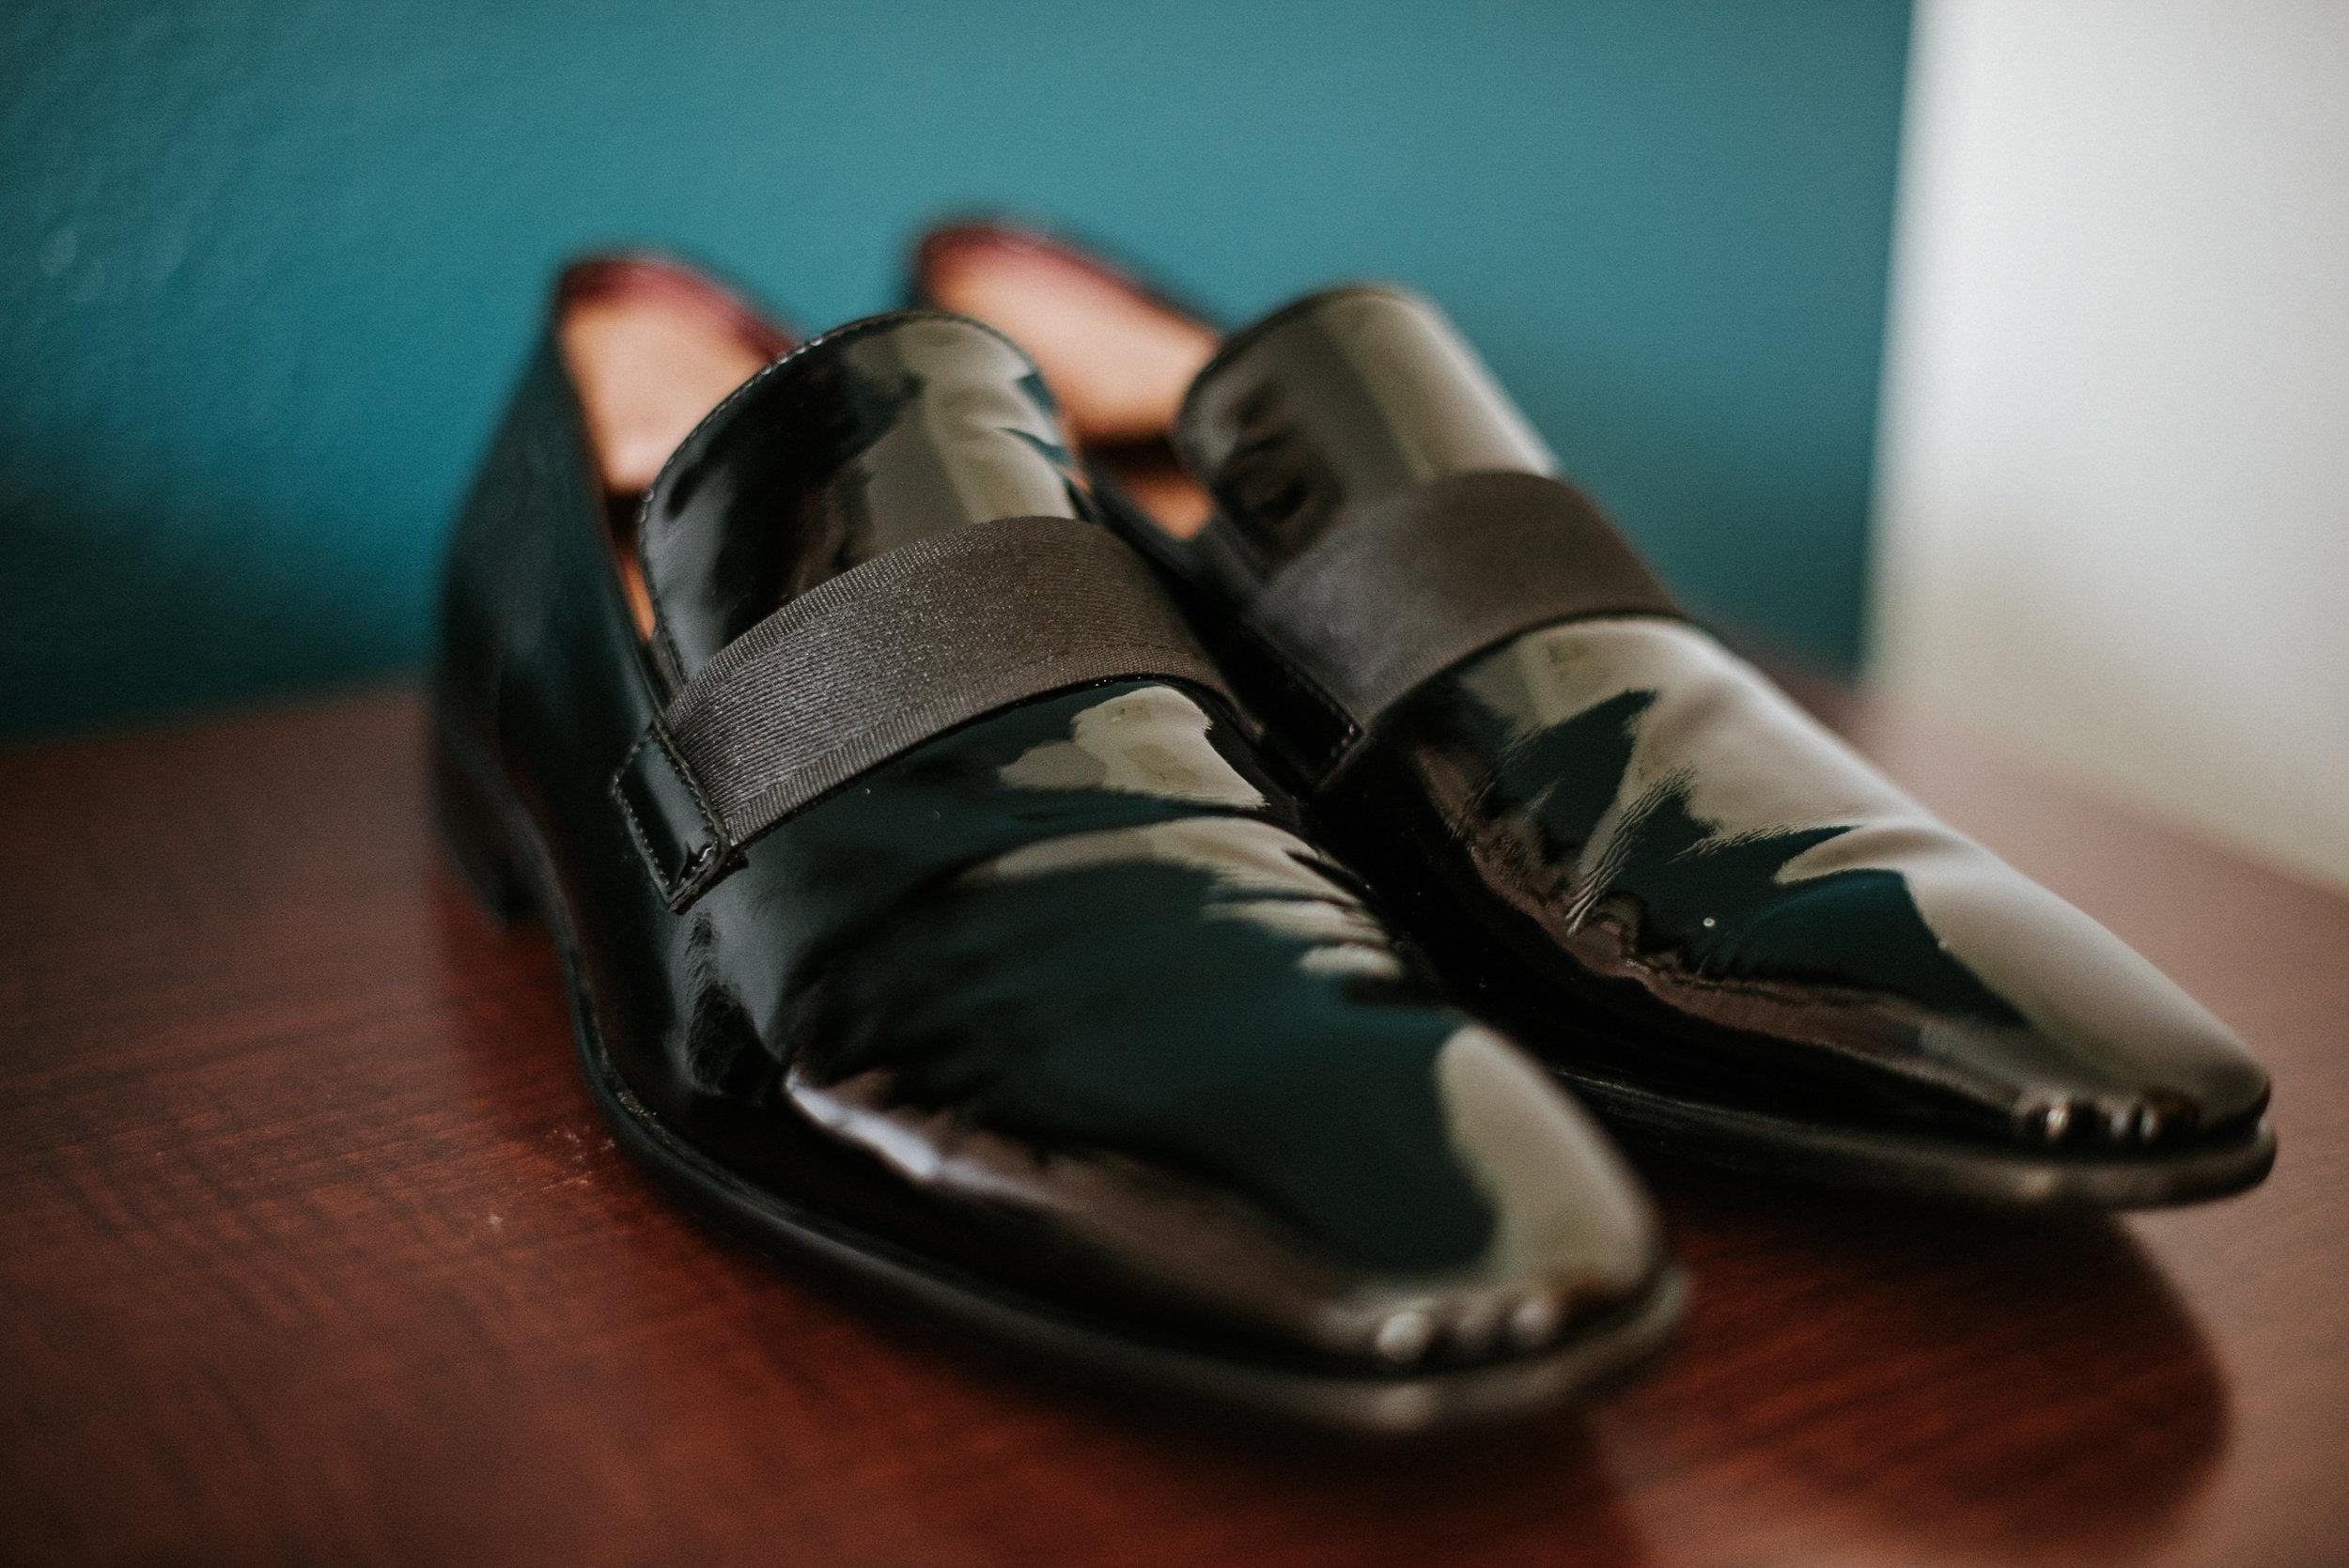 Groom's black dress shoes